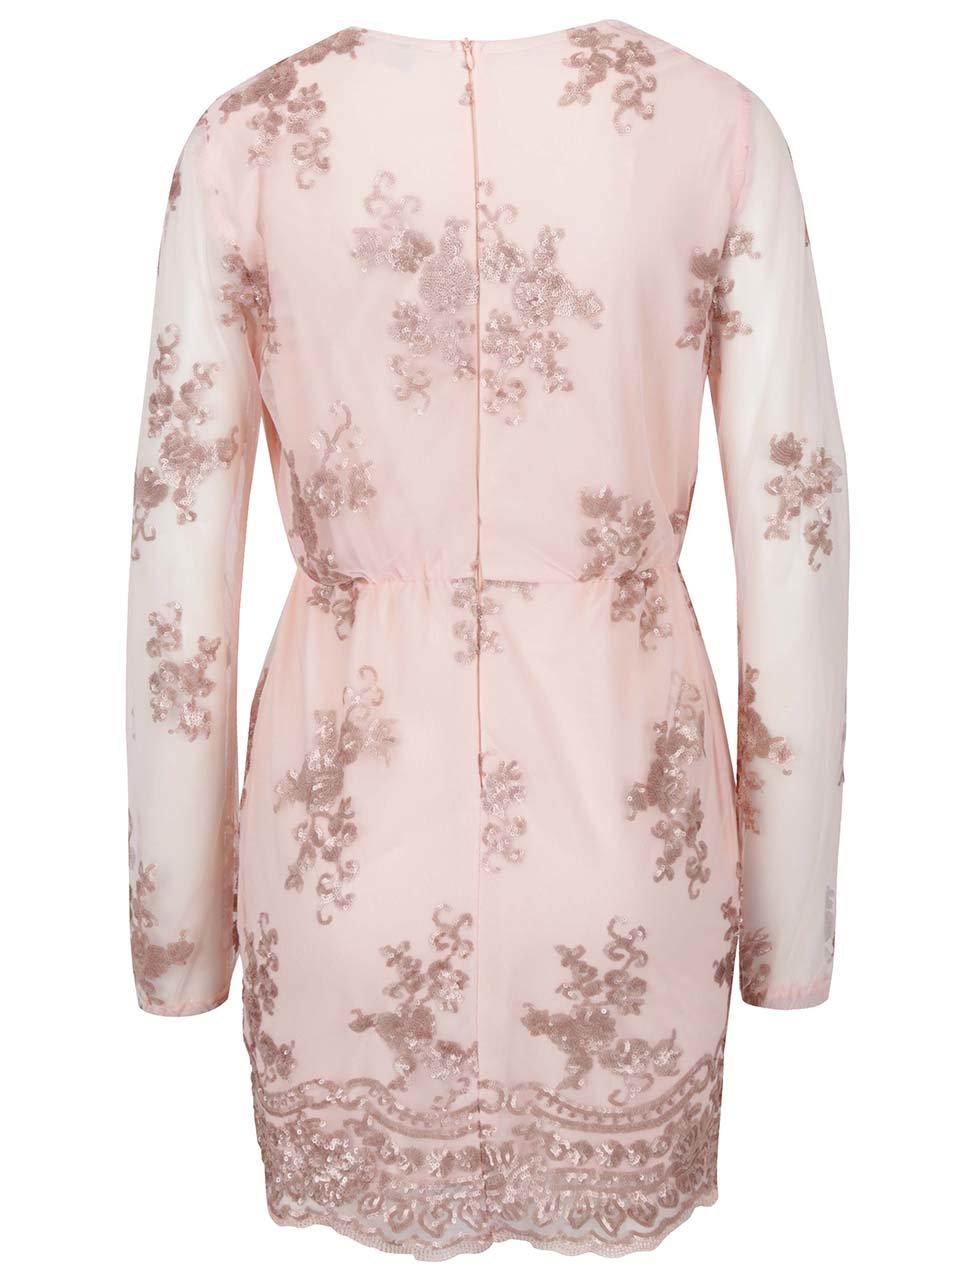 83e6e6605d85 Světle růžové šaty s krajkou a dlouhým rukávem AX Paris ...